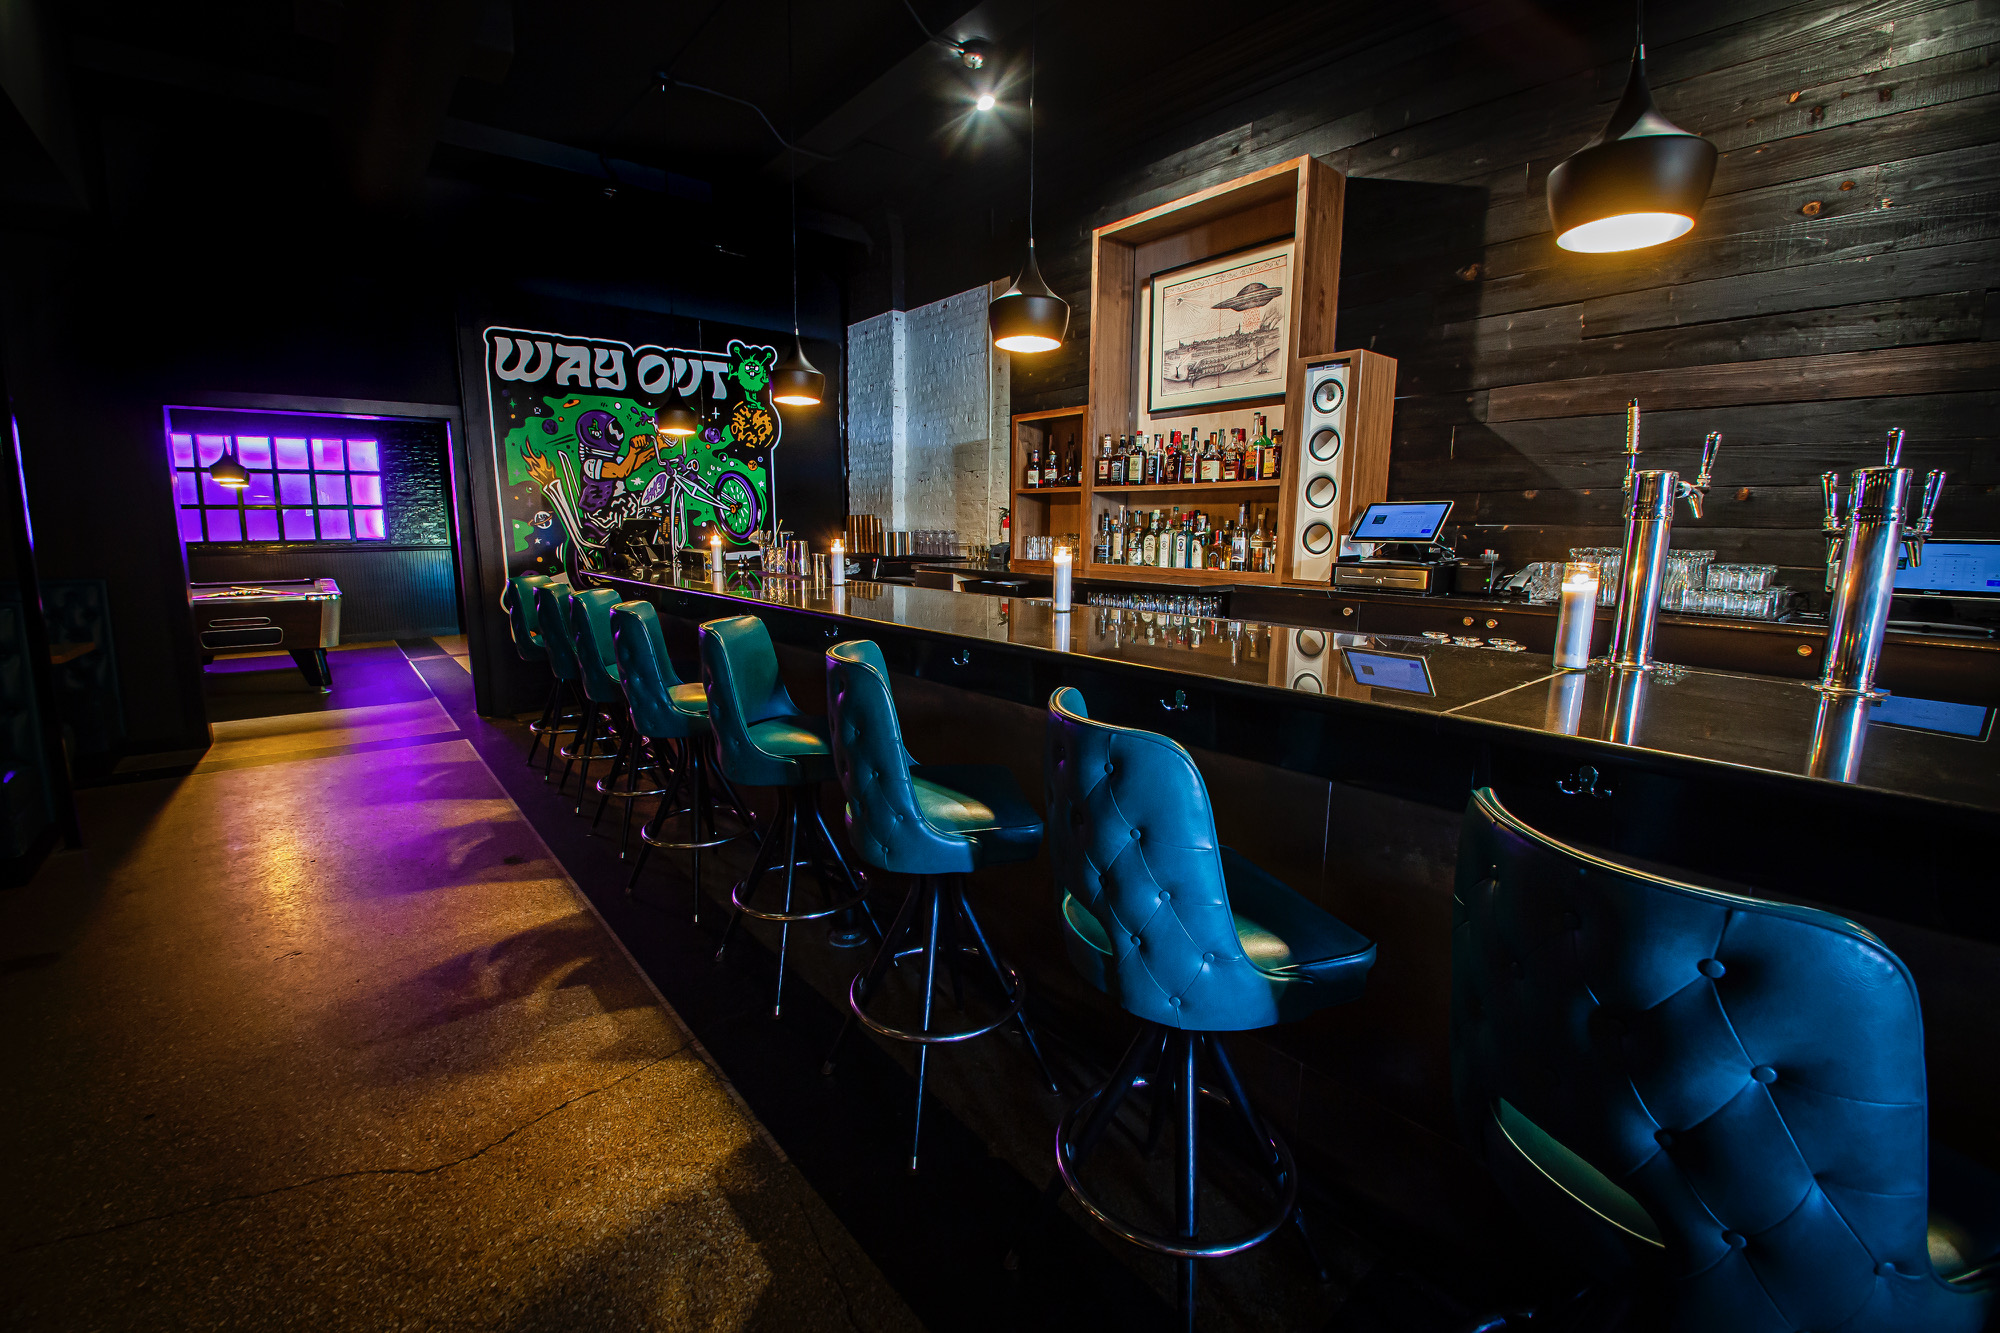 A dark bar with blue stools